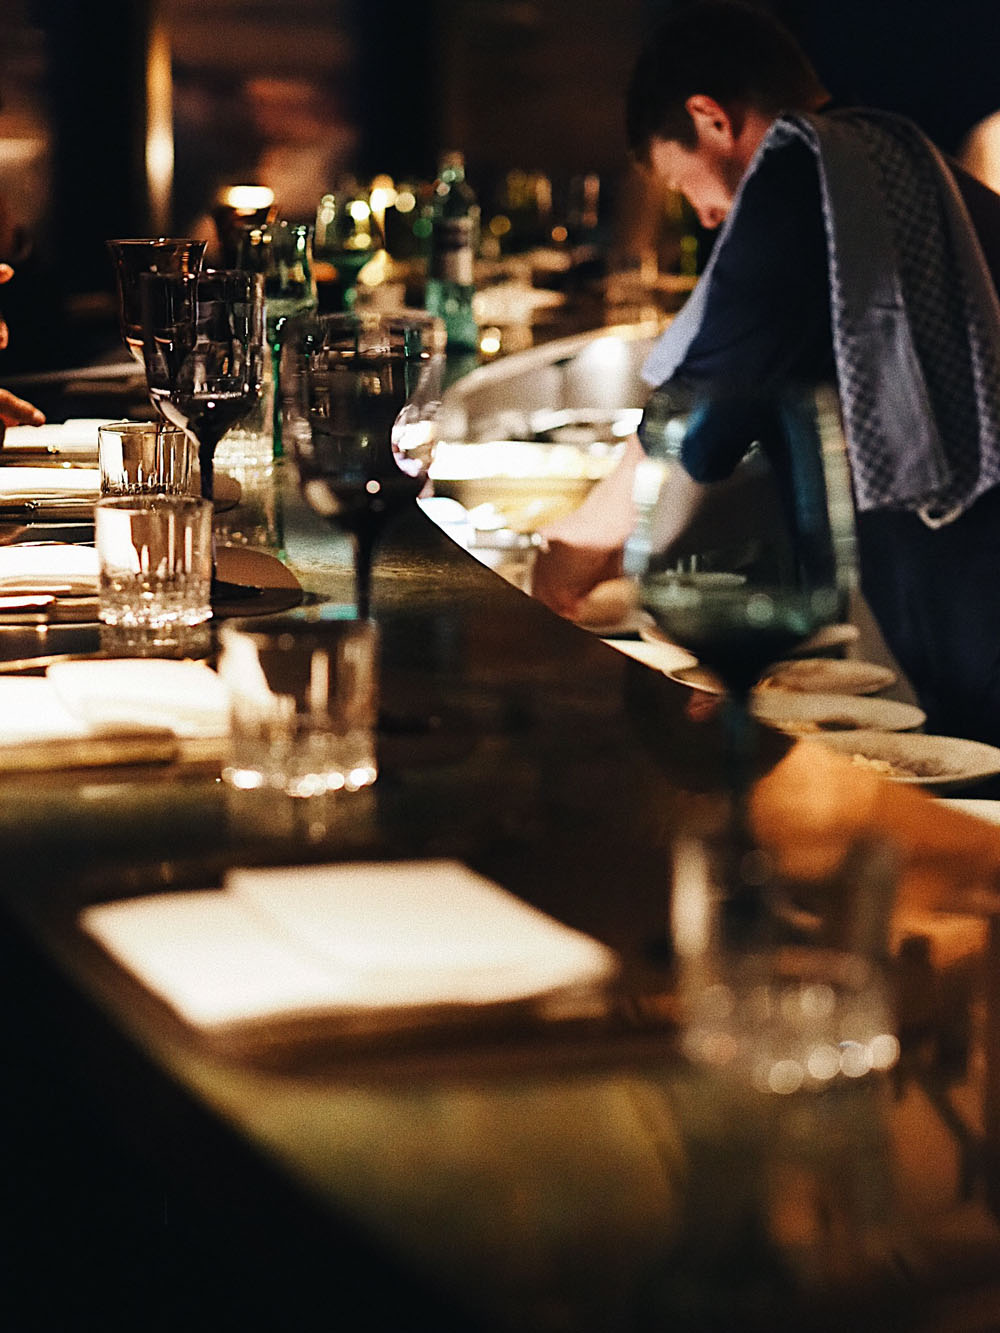 Allclad_kochgeschirr_Demostration_Franziska_Restaurant